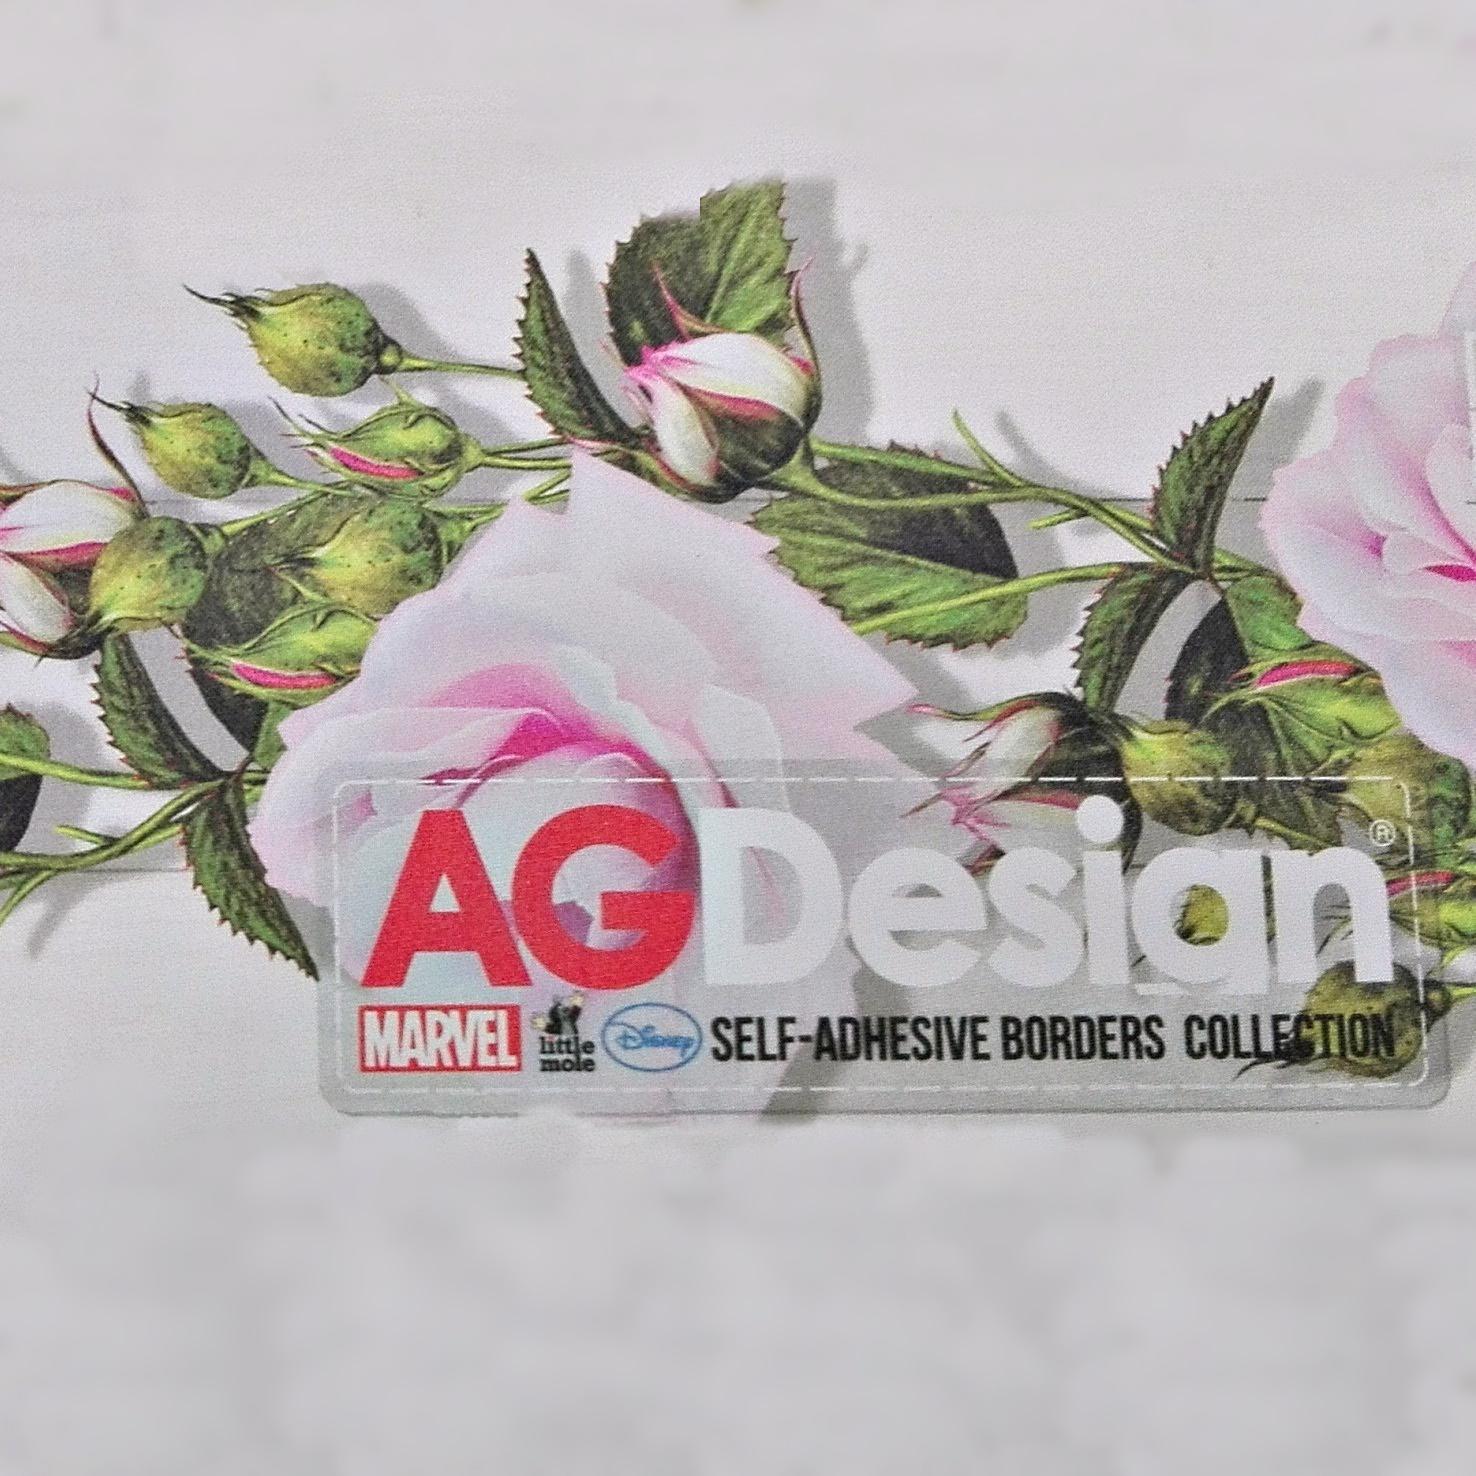 AG Design Borders katalógus